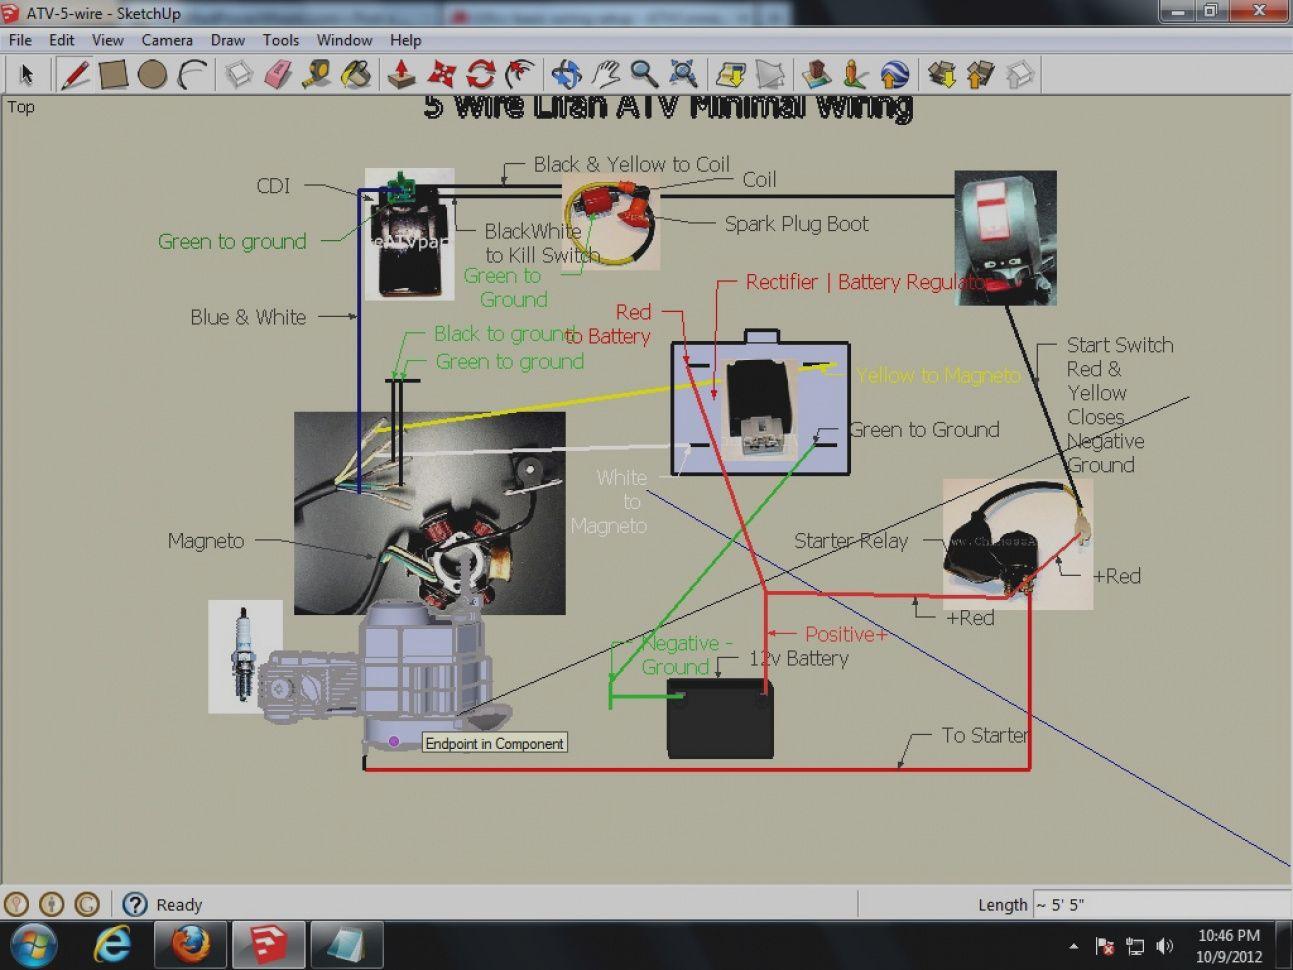 New 110cc Chinese Atv Wiring Diagram Atv 110 0 00 House Best Of Atv Camera Drawing Atv Quads